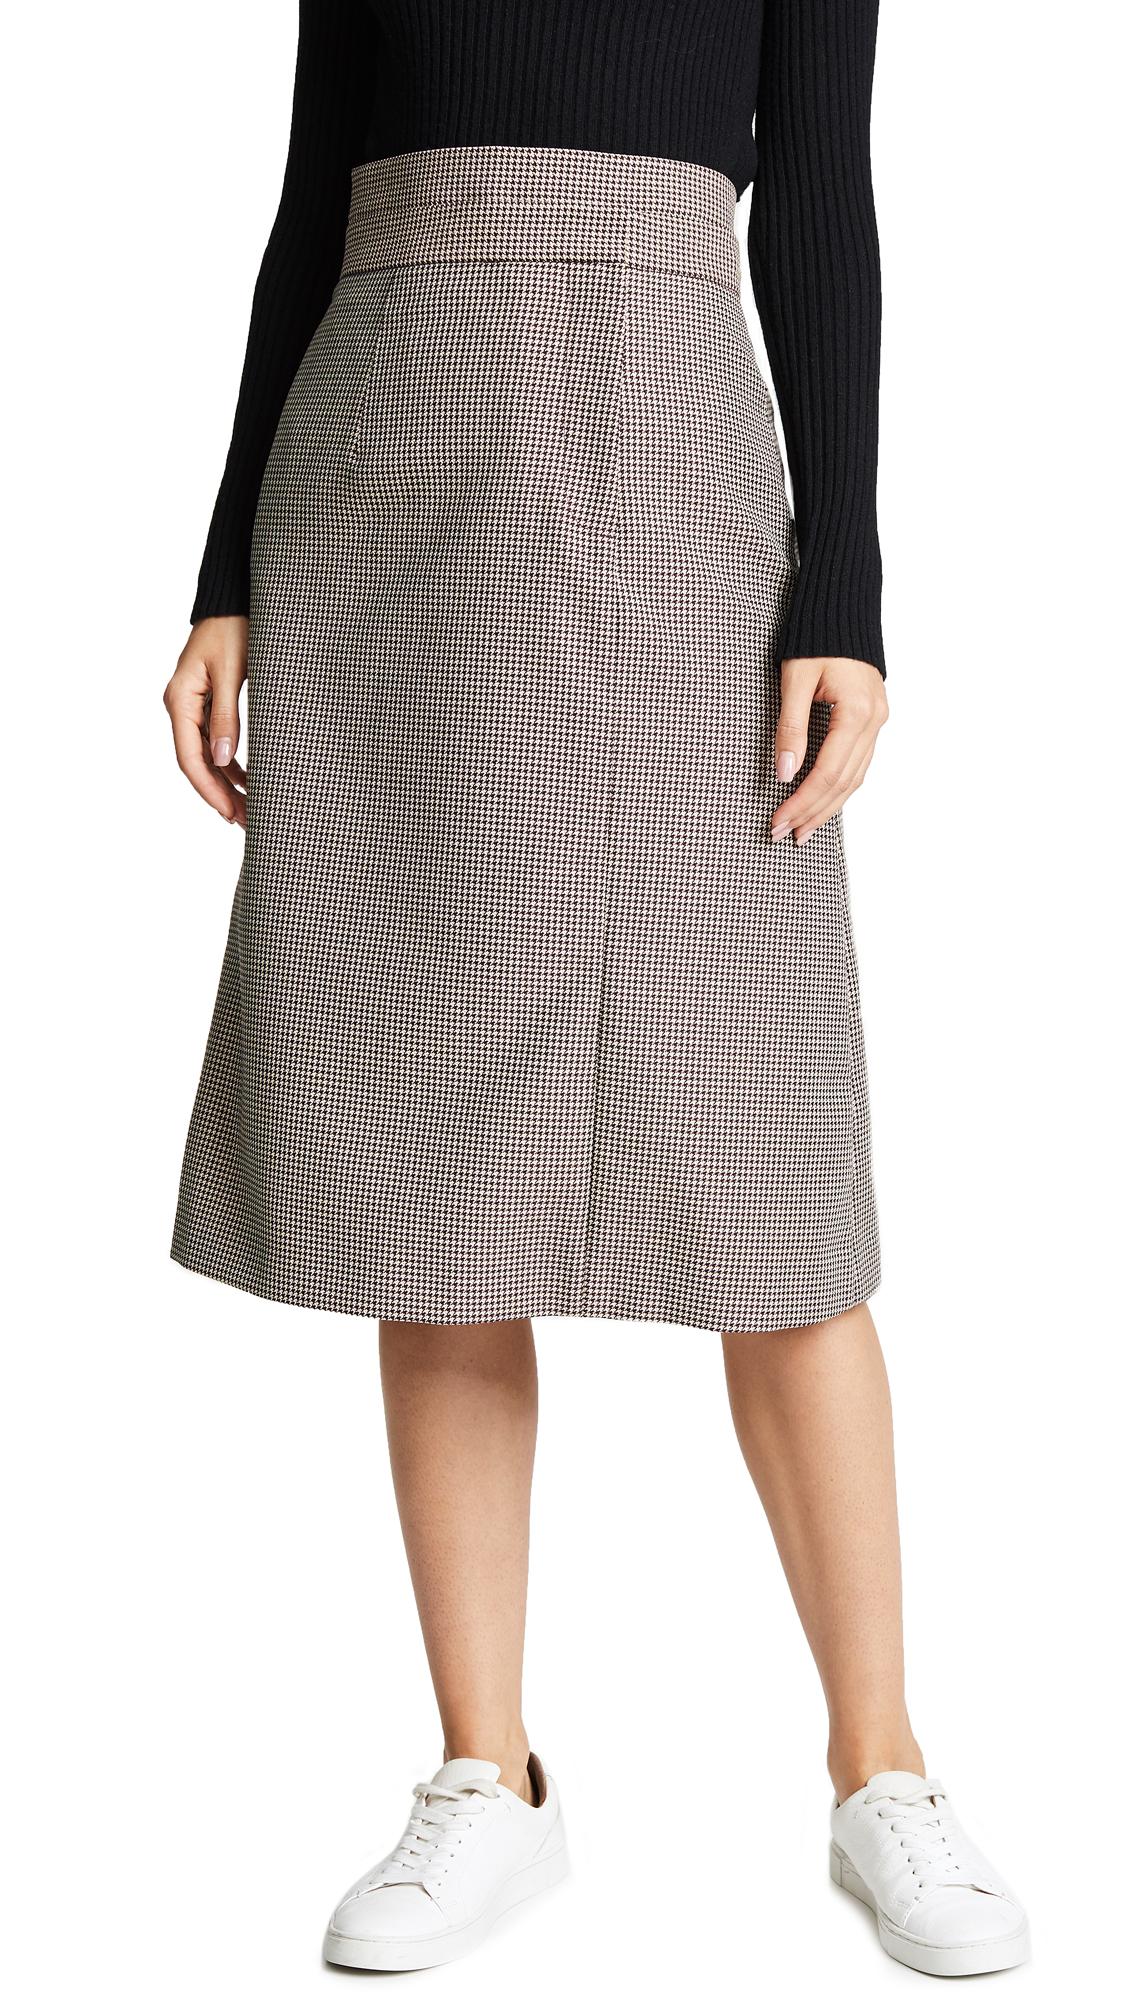 Double Layer Skirt, Khaki